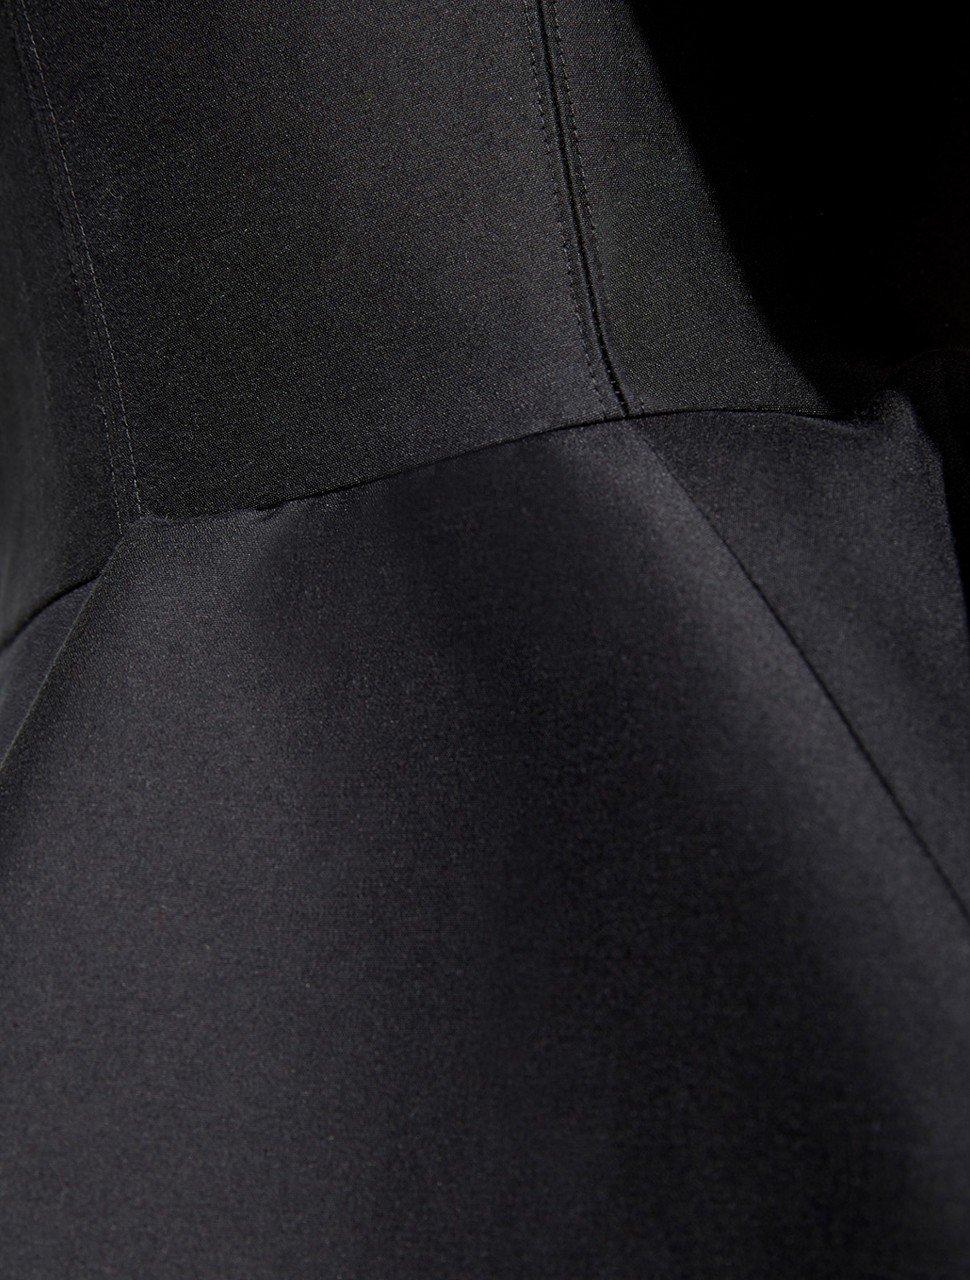 CAP SLV V NECK DRESS W PEPLUM